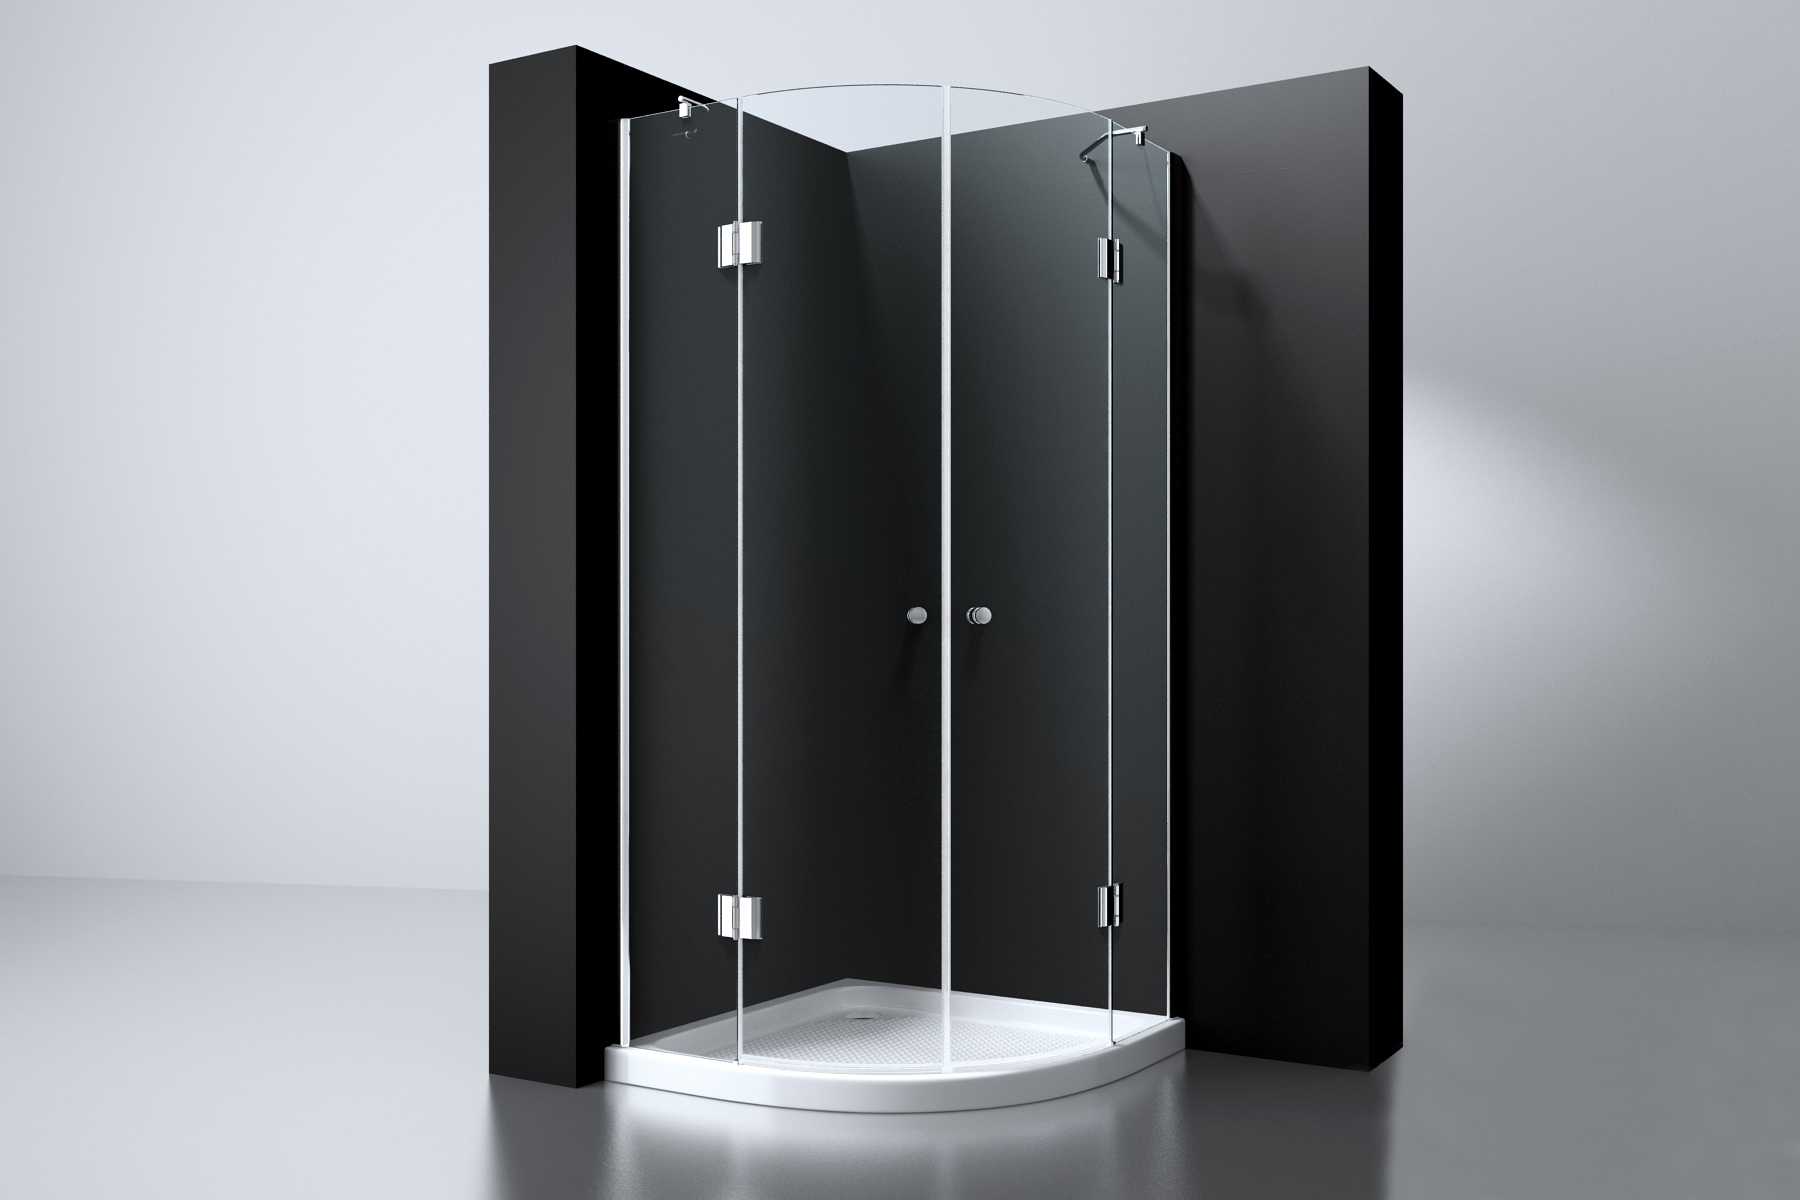 Best Design Arek kwartronde douchecabine 90x90cm ANTI-KALK